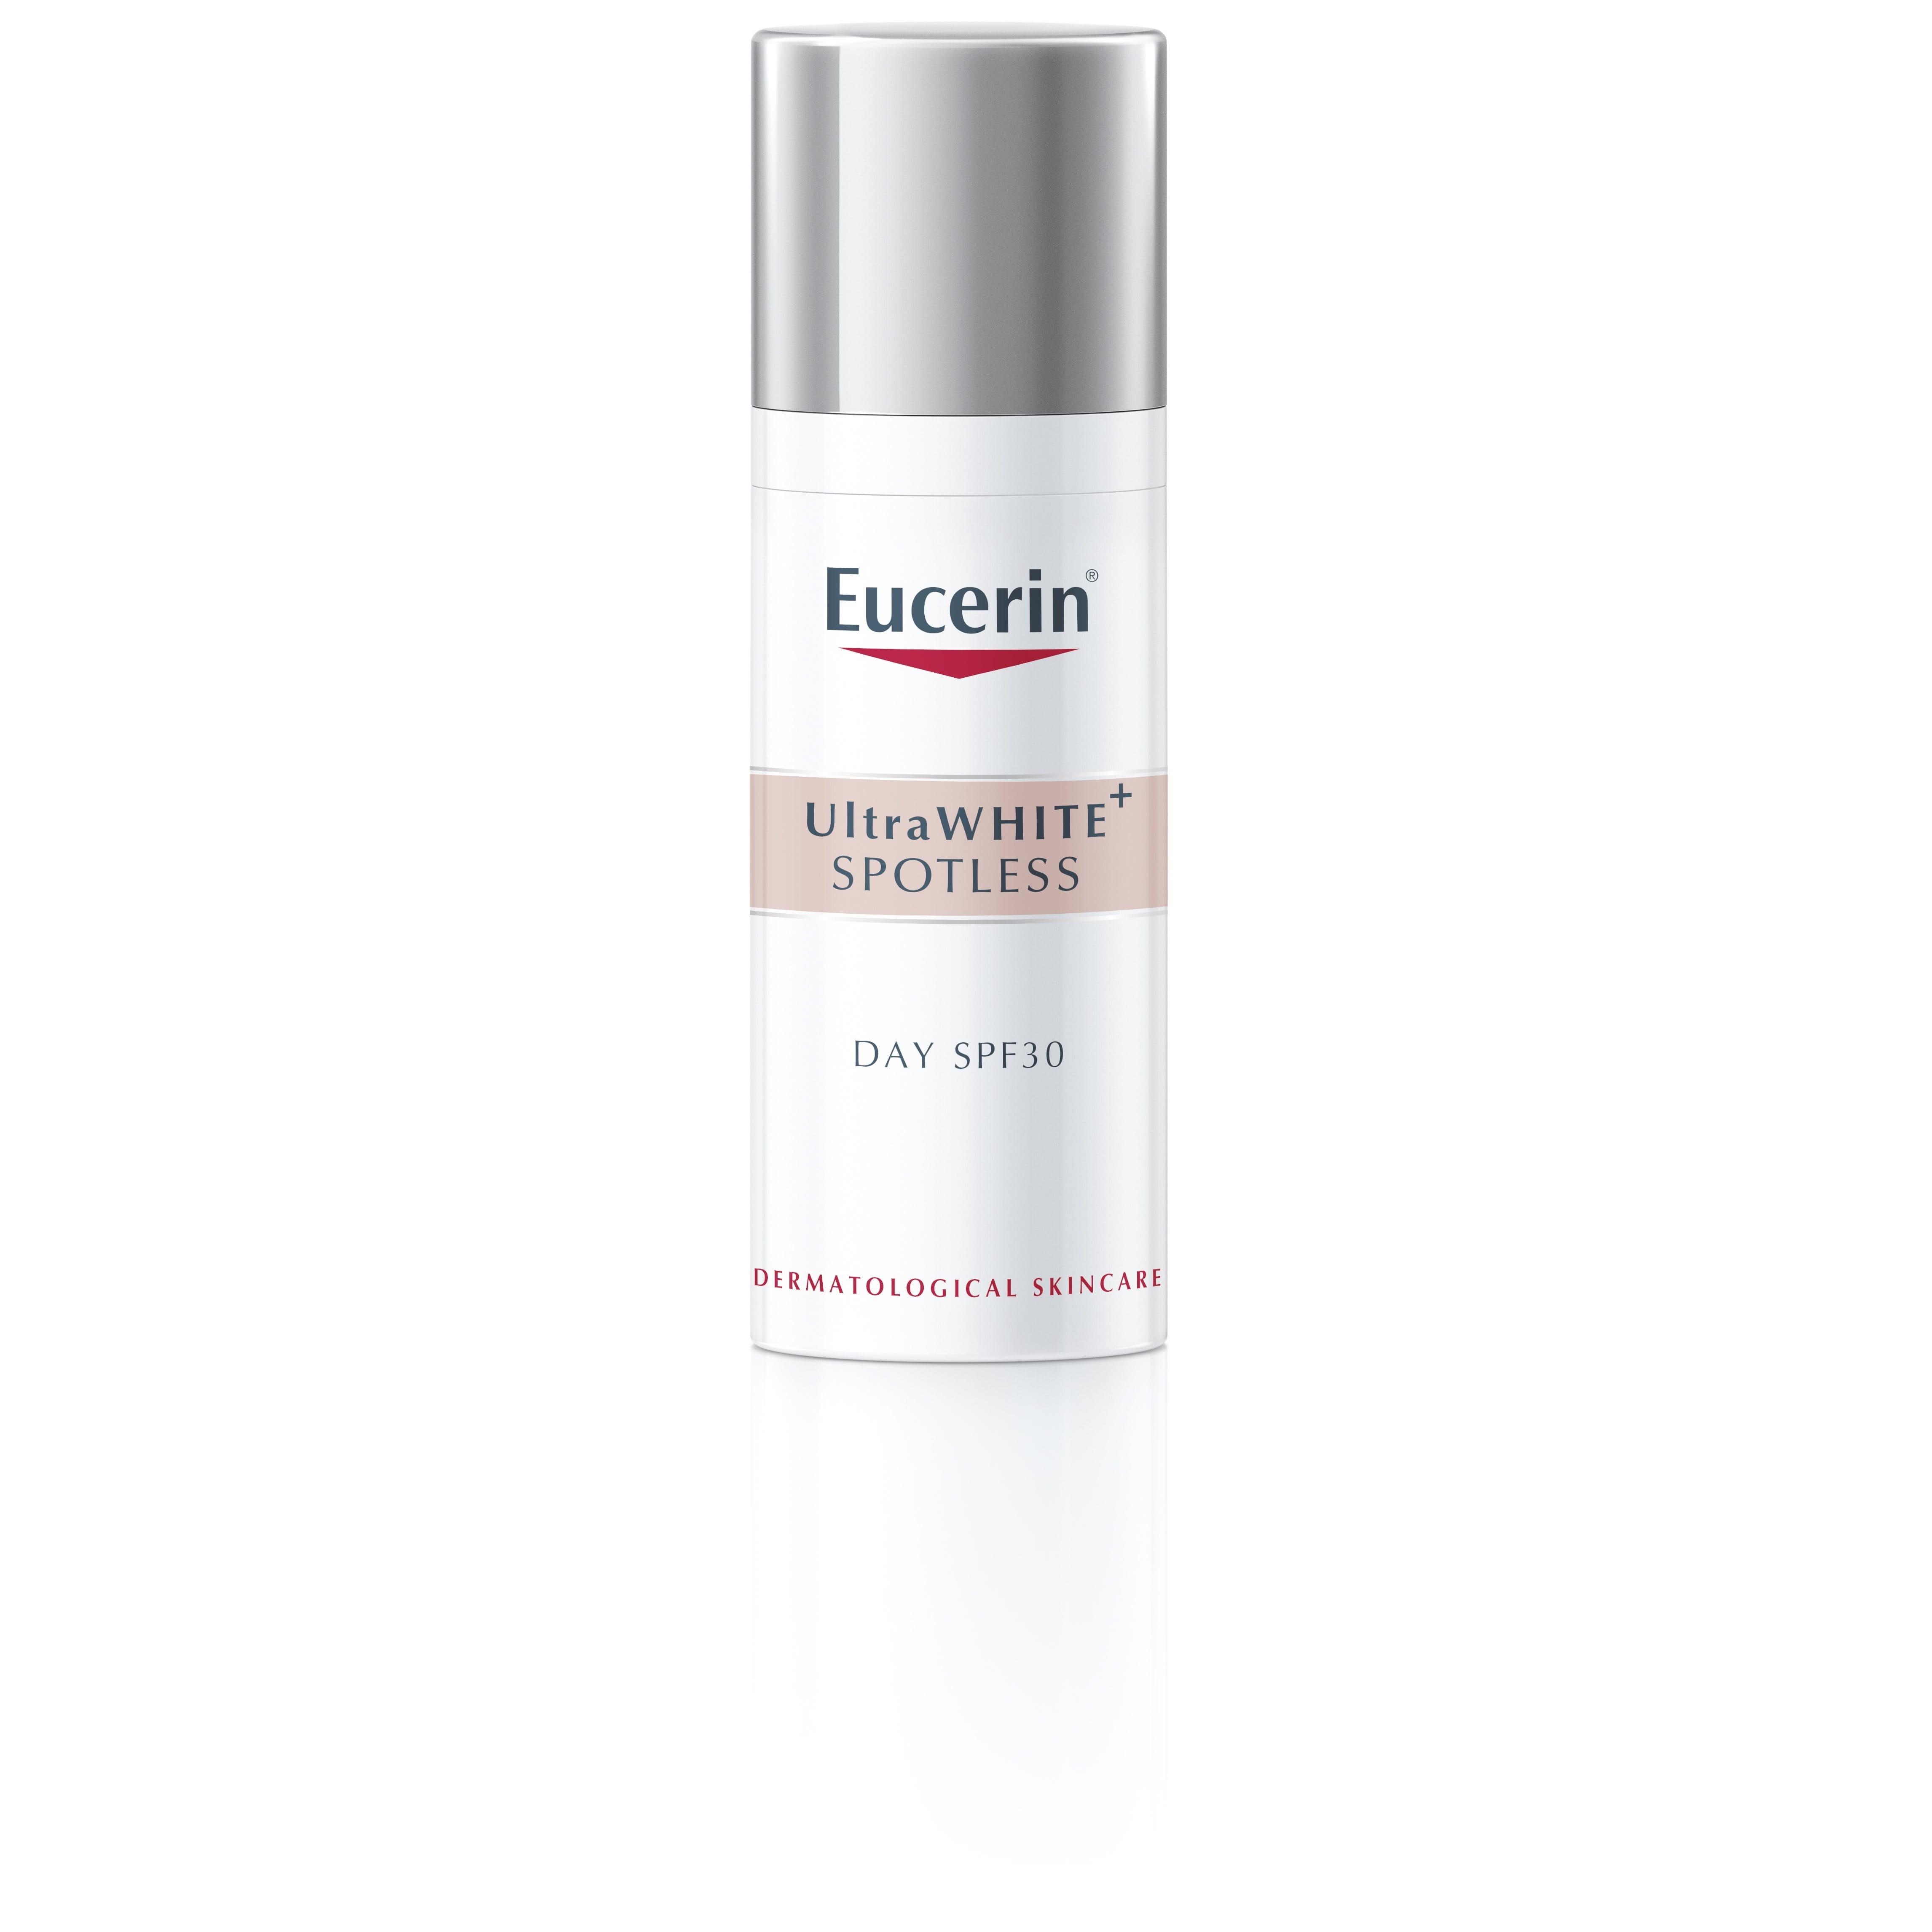 Eucerin Ultrawhite Spotless Day Fluid